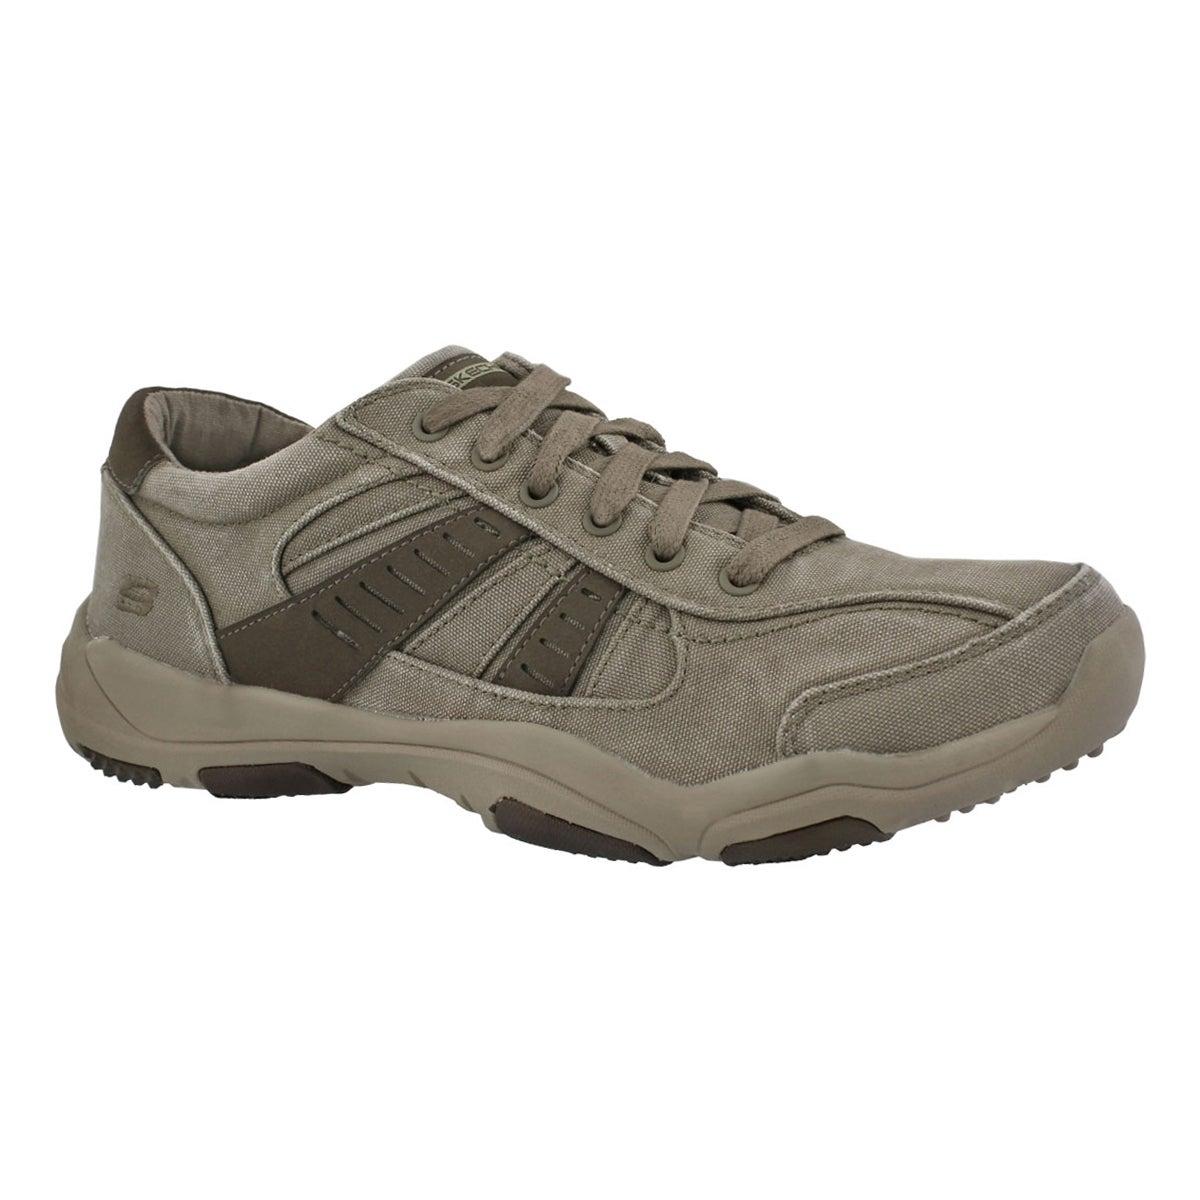 Men's LARSON MASSON taupe slip on sneakers